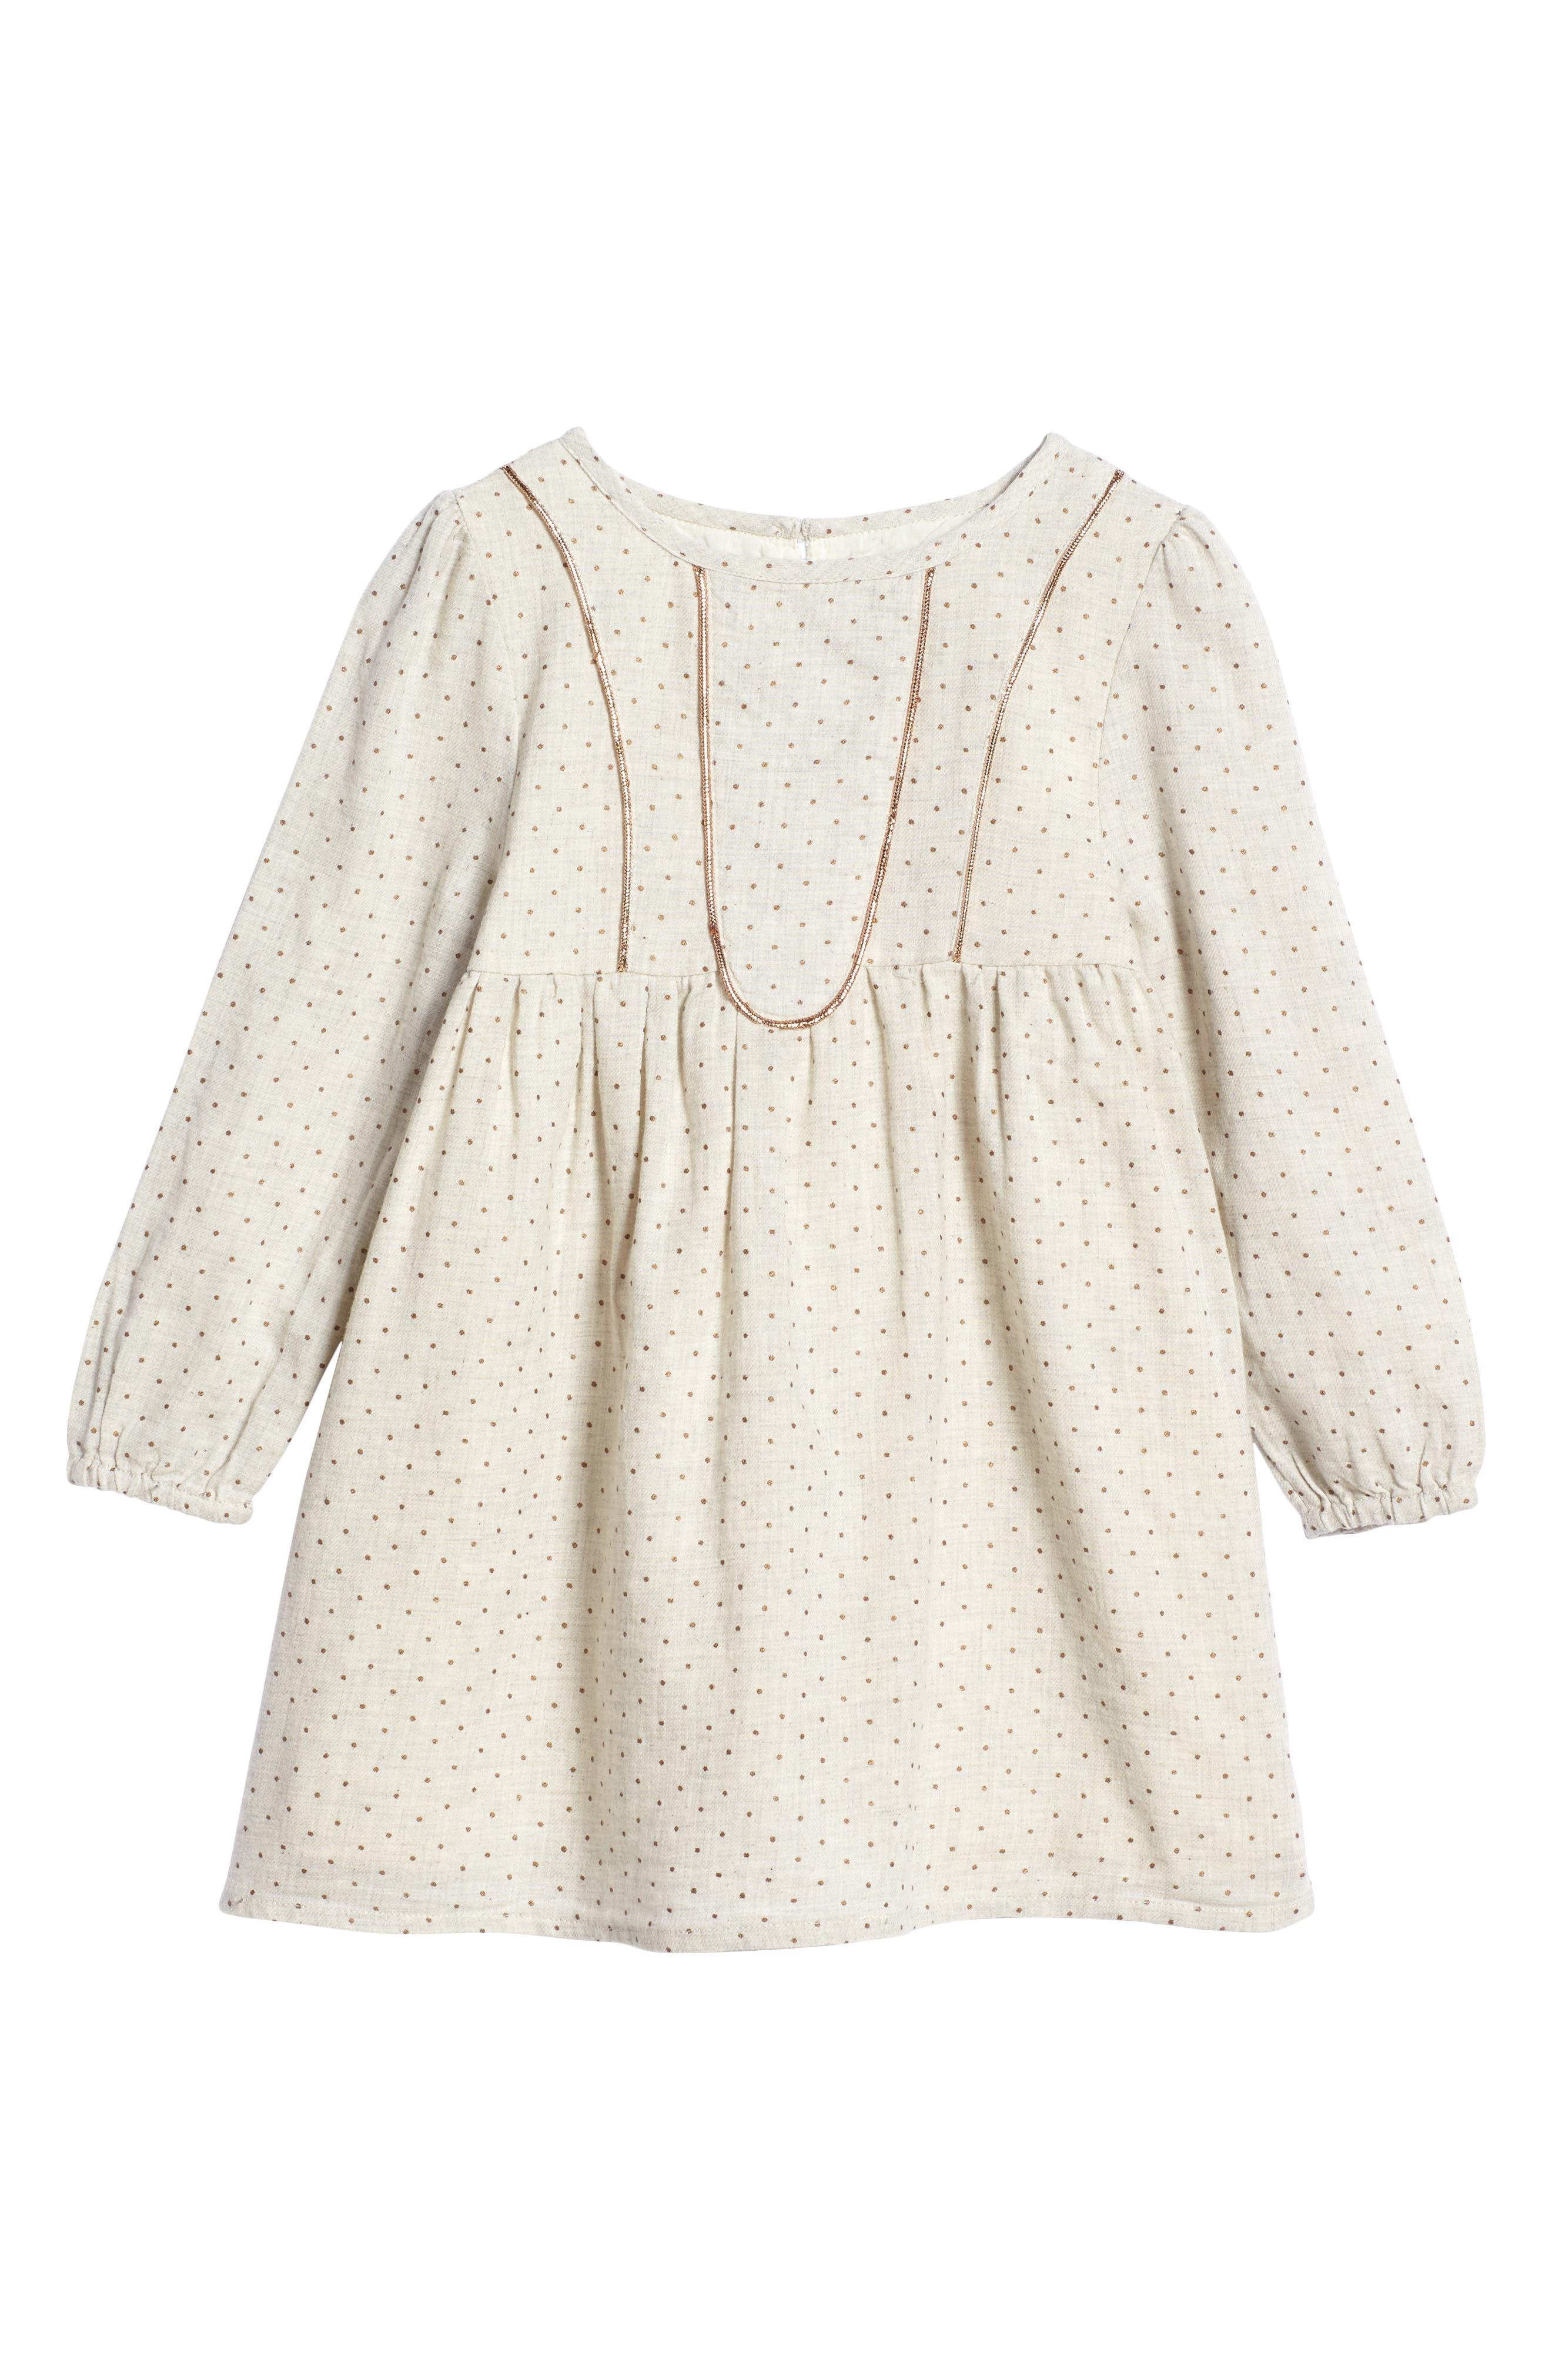 Peek Scarlet Dress (Toddler Girls, Little Girls & Big Girls)